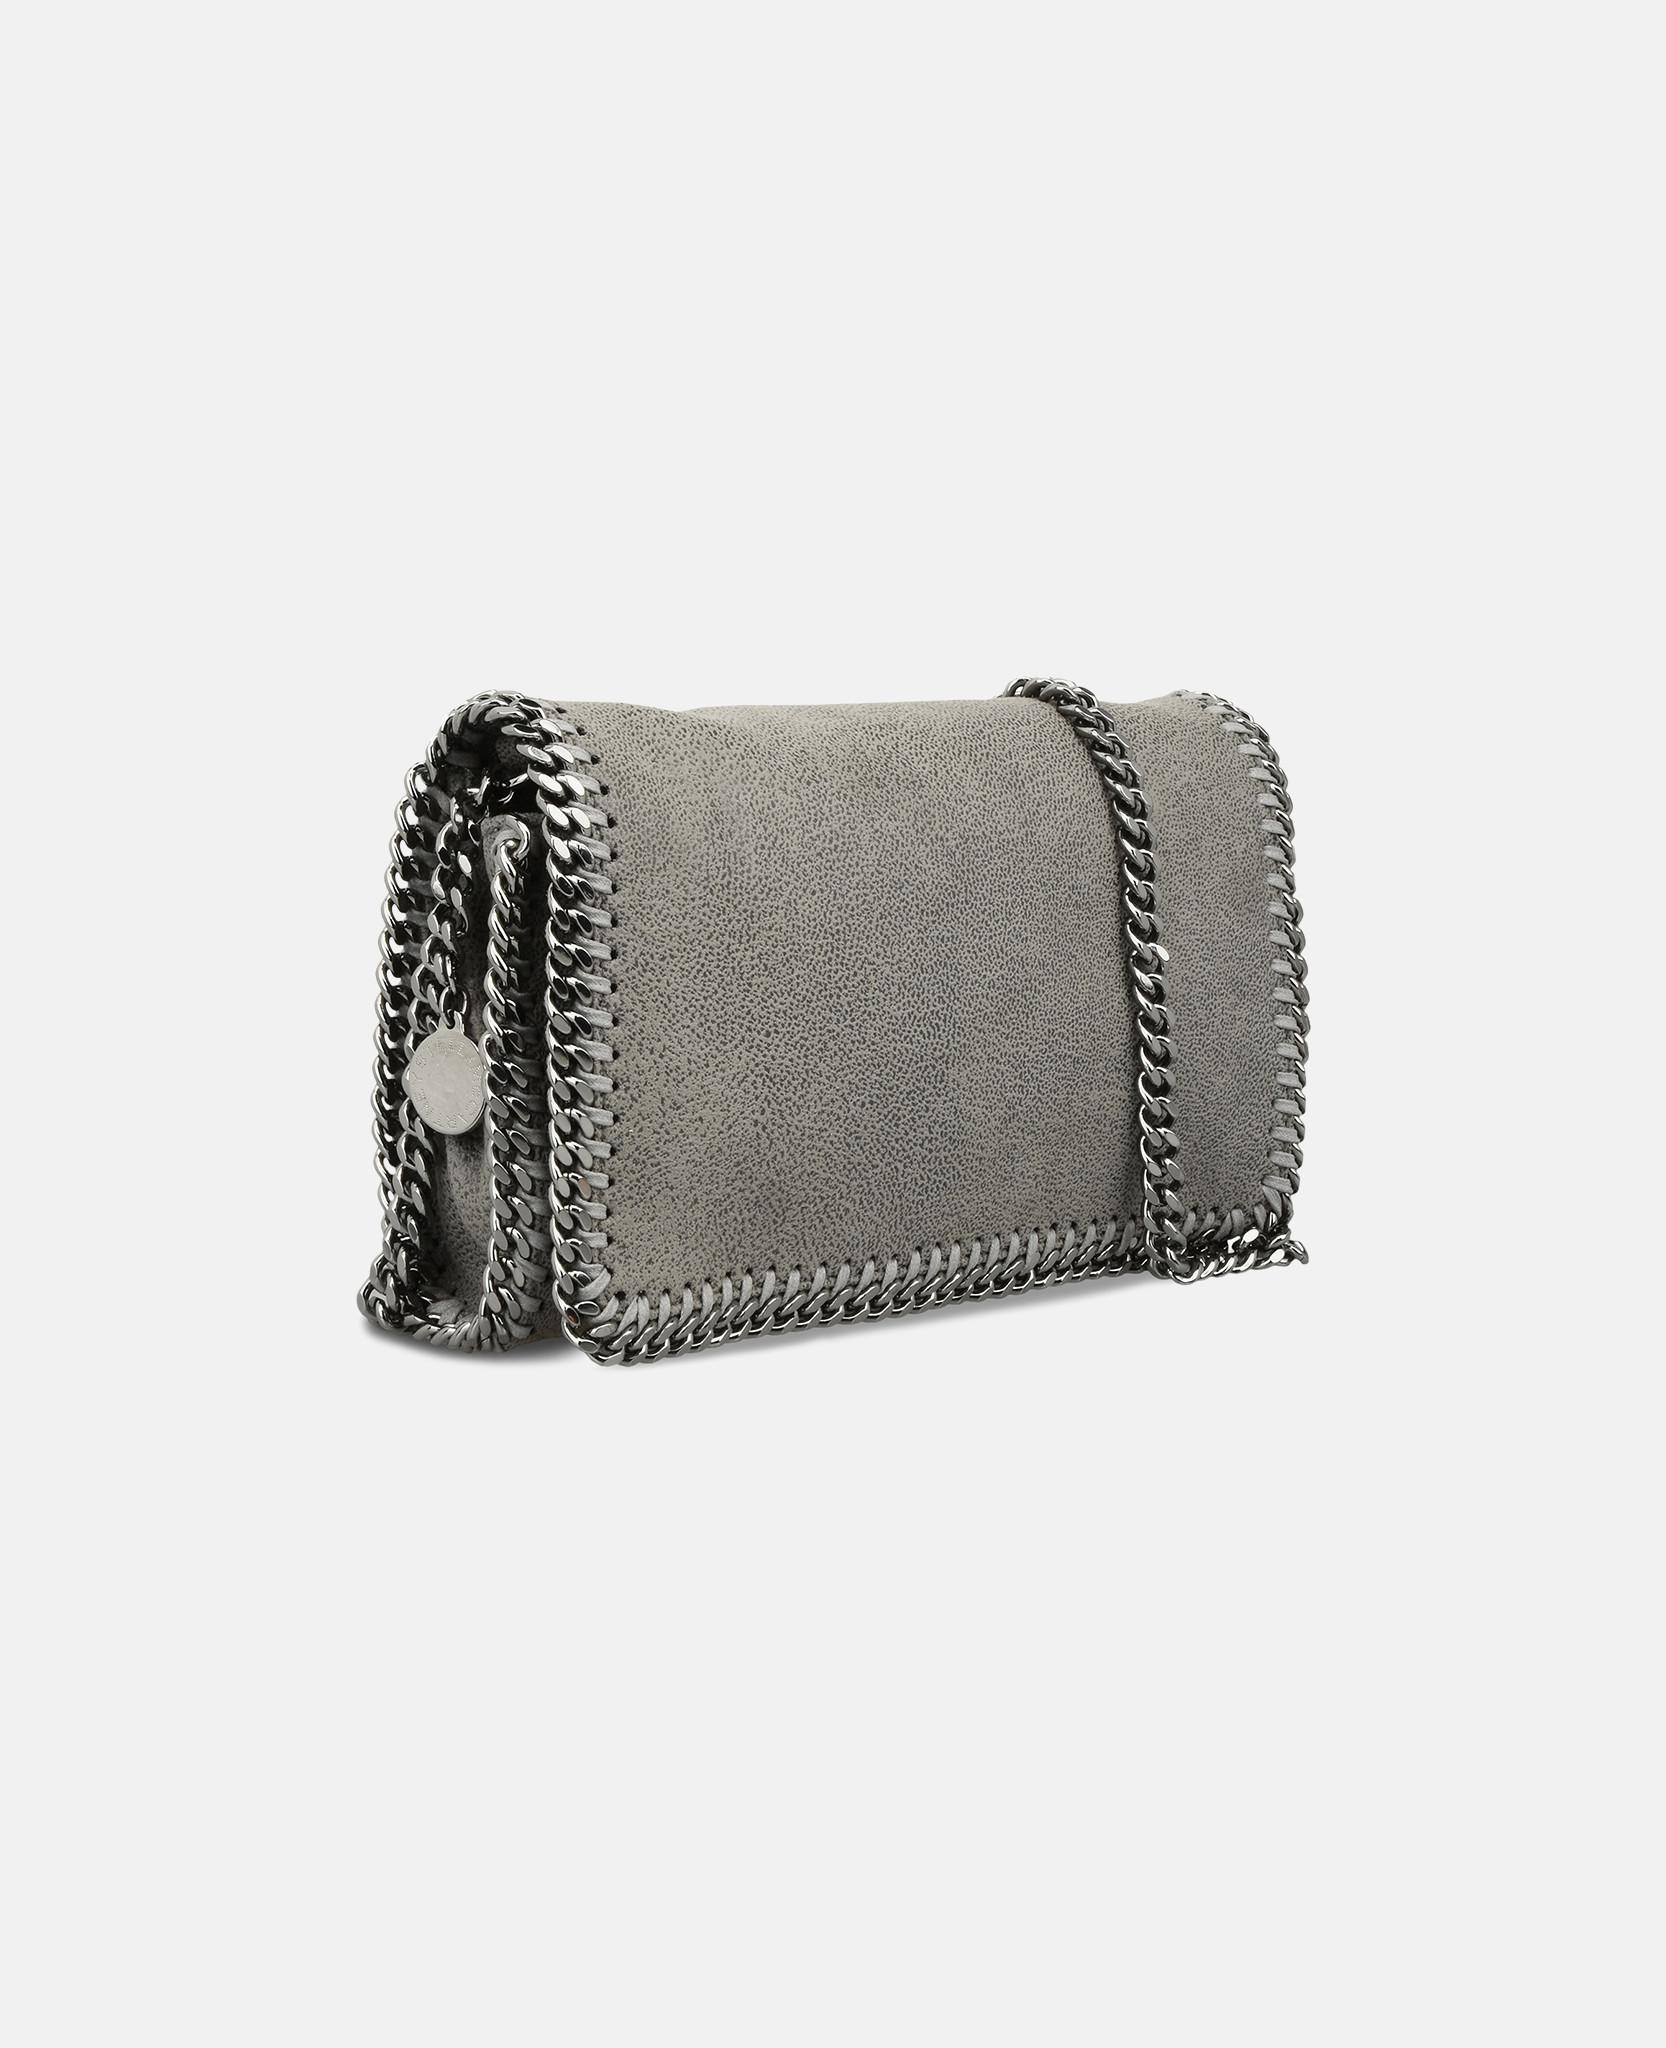 0e64834d61d8 Lyst - Stella McCartney Light Grey Falabella Cross Body Bag in Gray